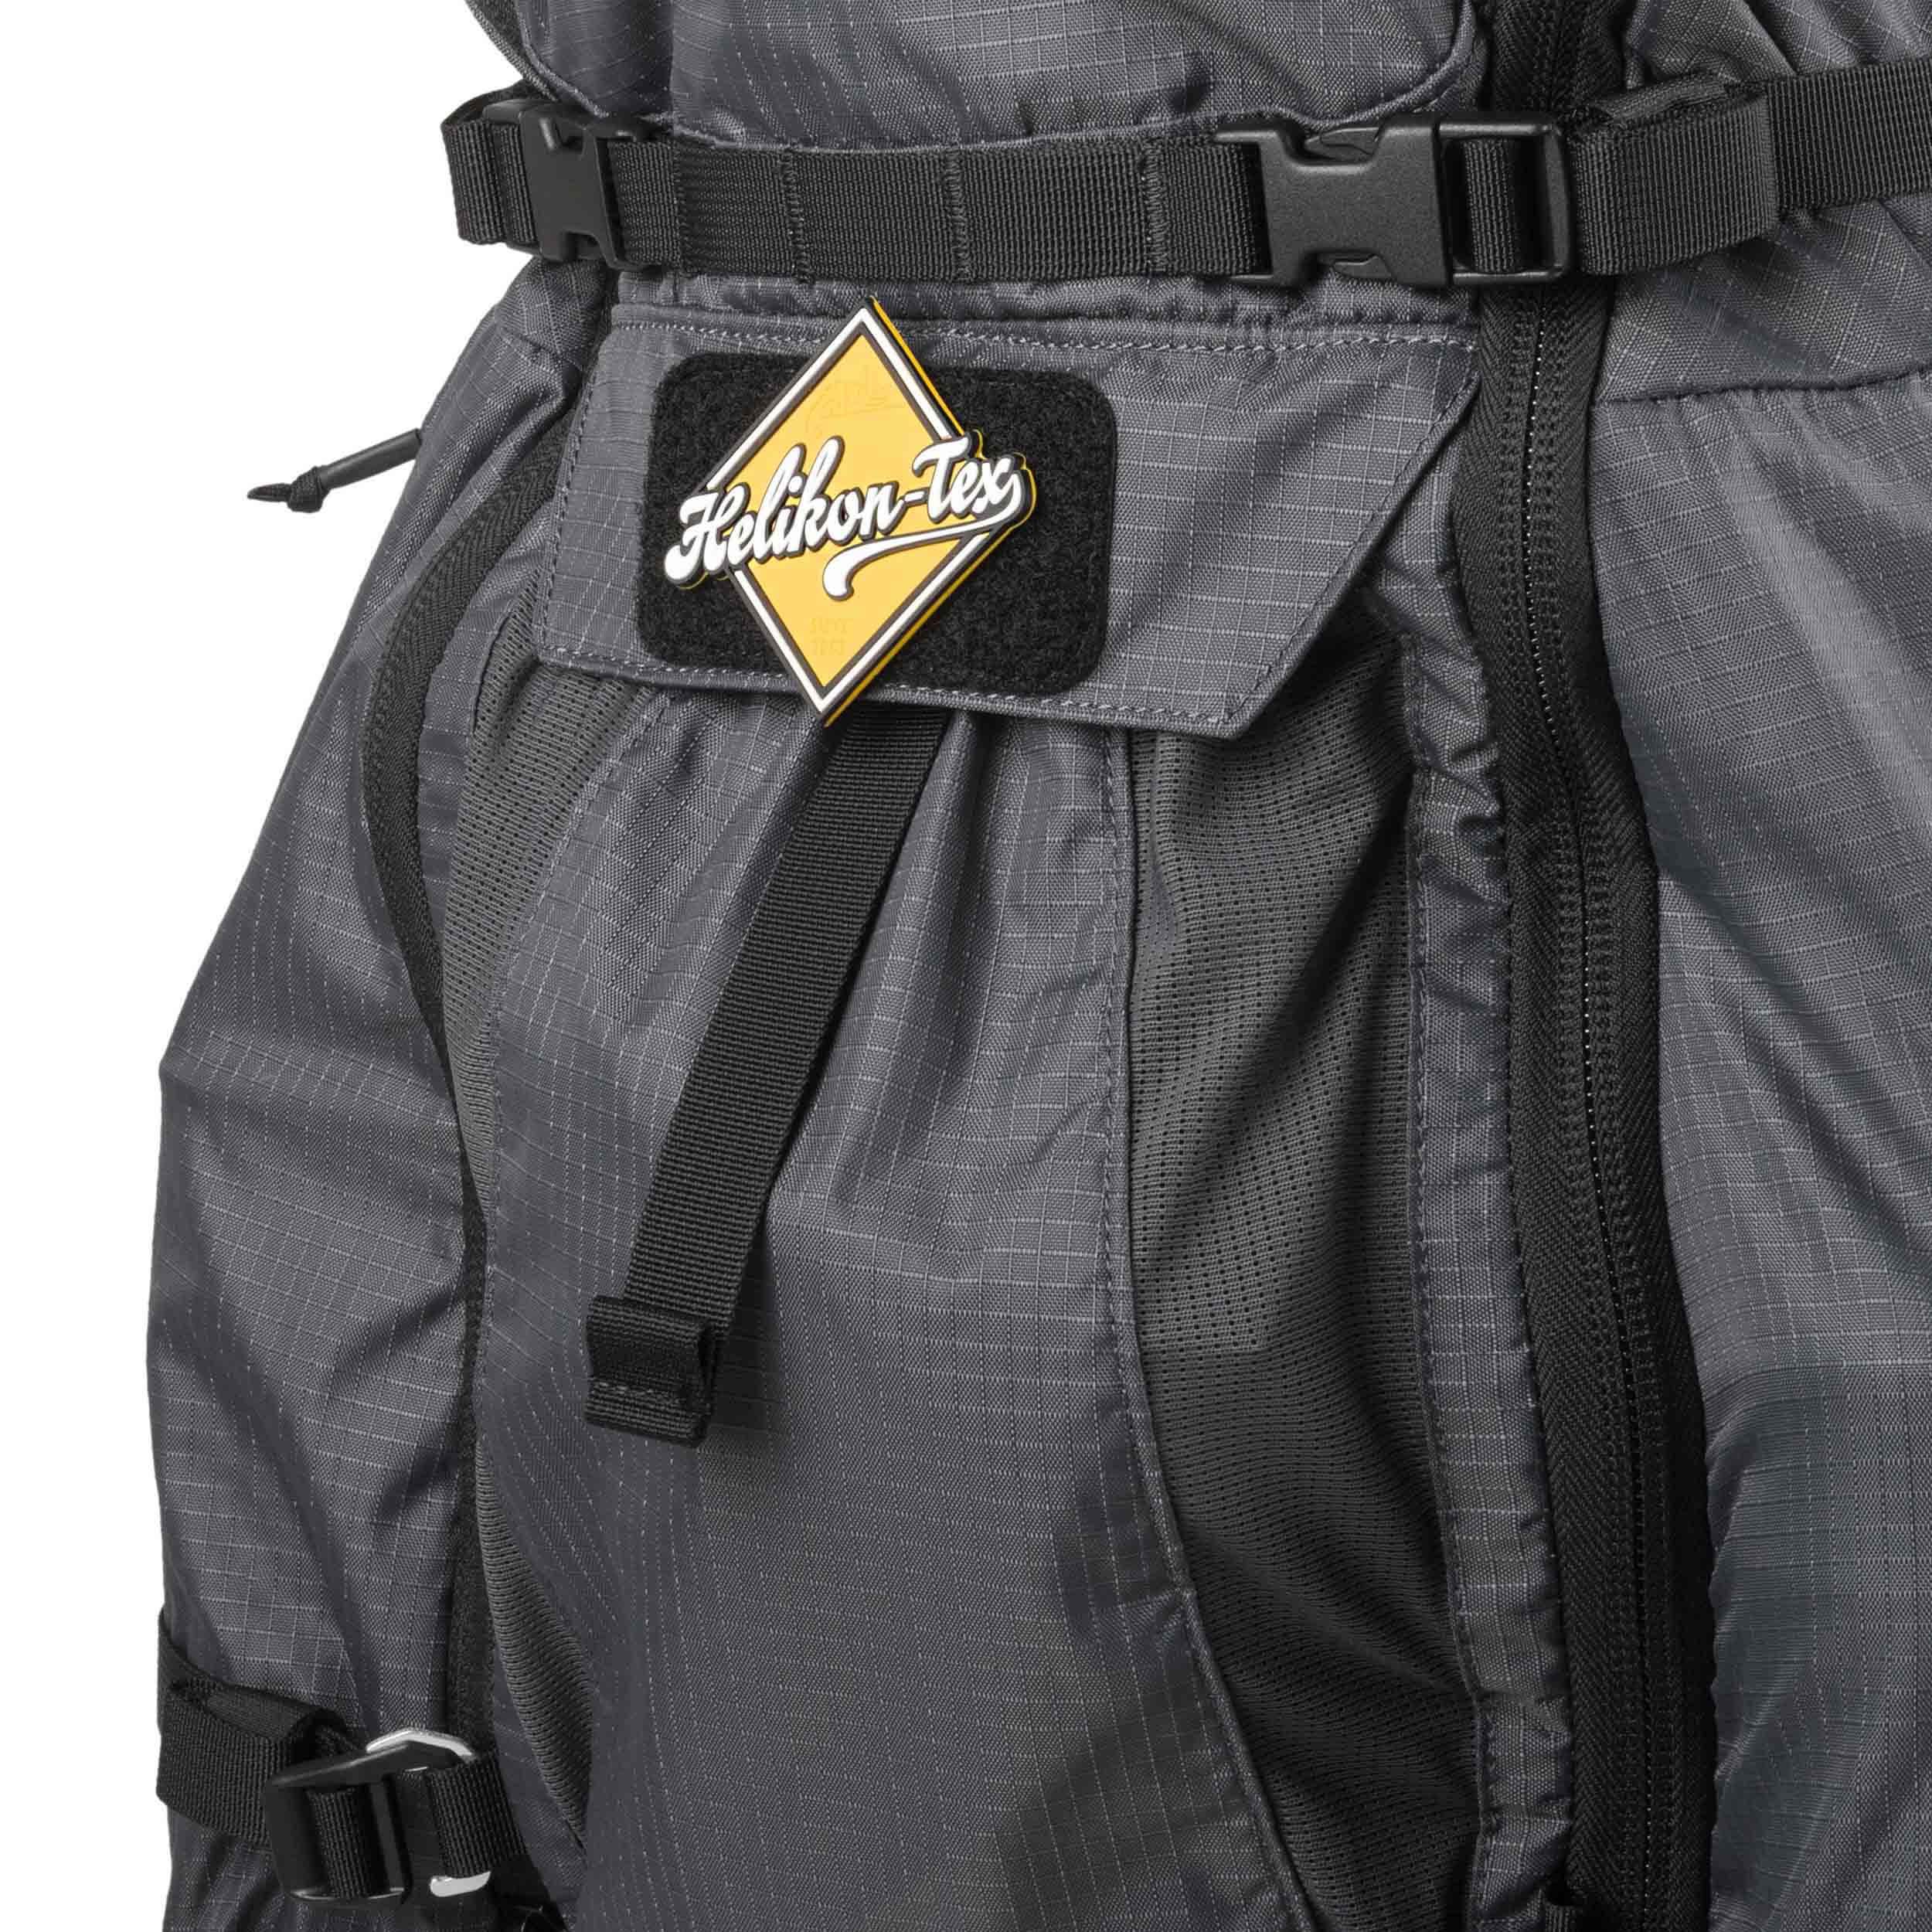 Helikon-Tex Elevation Backpack Rucksack -Nylon- Black